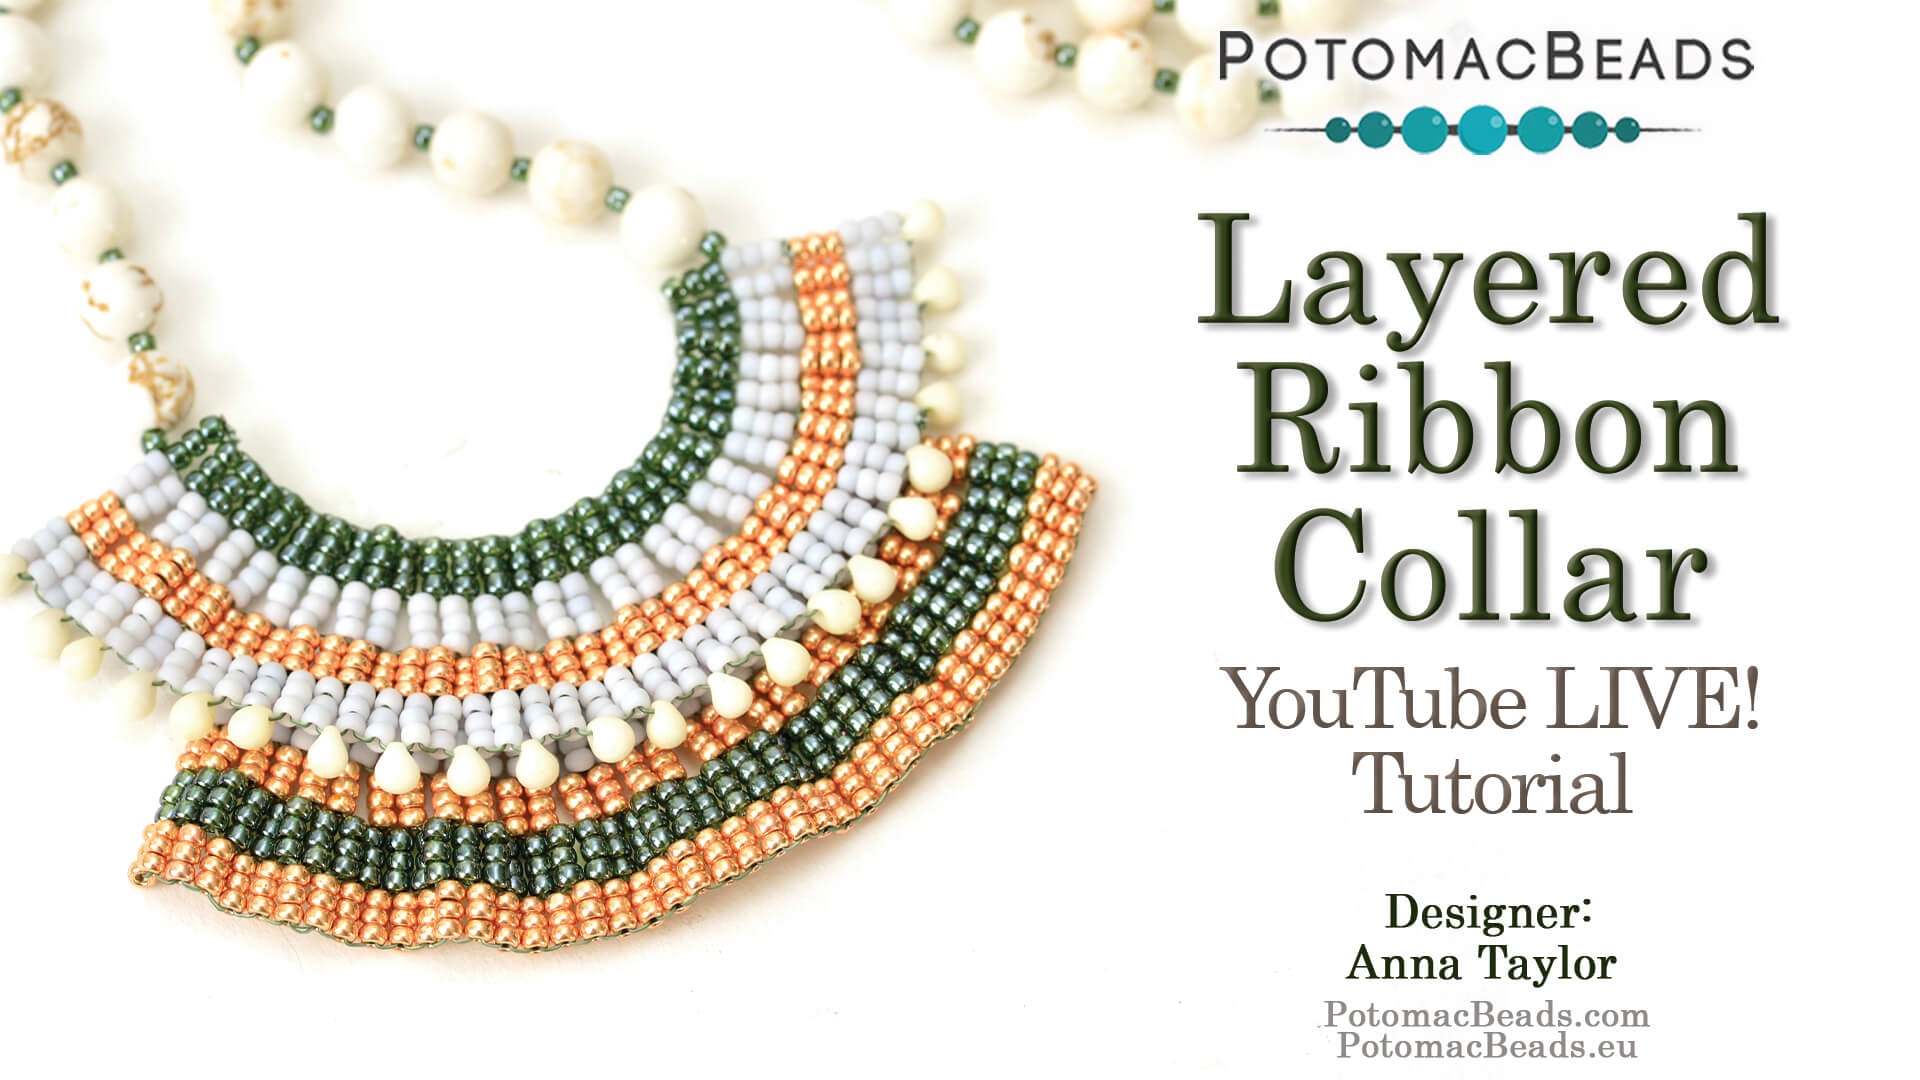 How to Bead Jewelry / Beading Tutorials & Jewel Making Videos / Bead Weaving Tutorials & Necklace Tutorial / Layered Ribbon Collar Tutorial